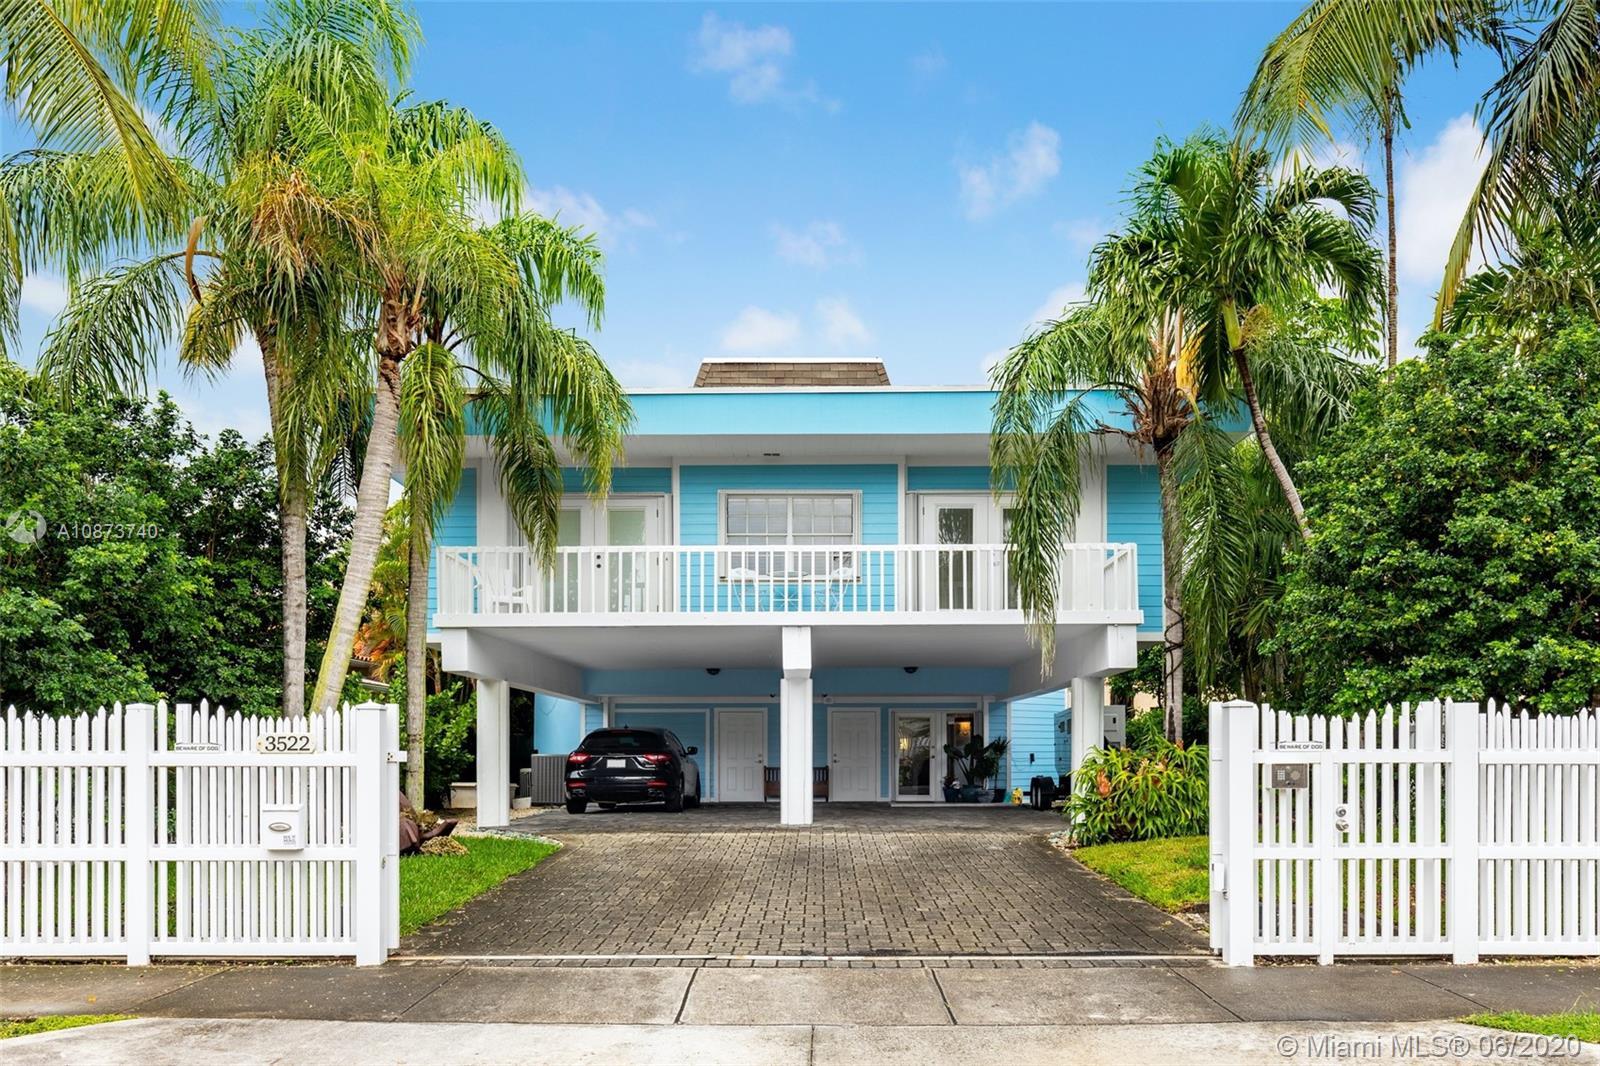 3522 Crystal Ct, Miami, Florida 33133, 3 Bedrooms Bedrooms, ,3 BathroomsBathrooms,Residential,For Sale,3522 Crystal Ct,A10873740